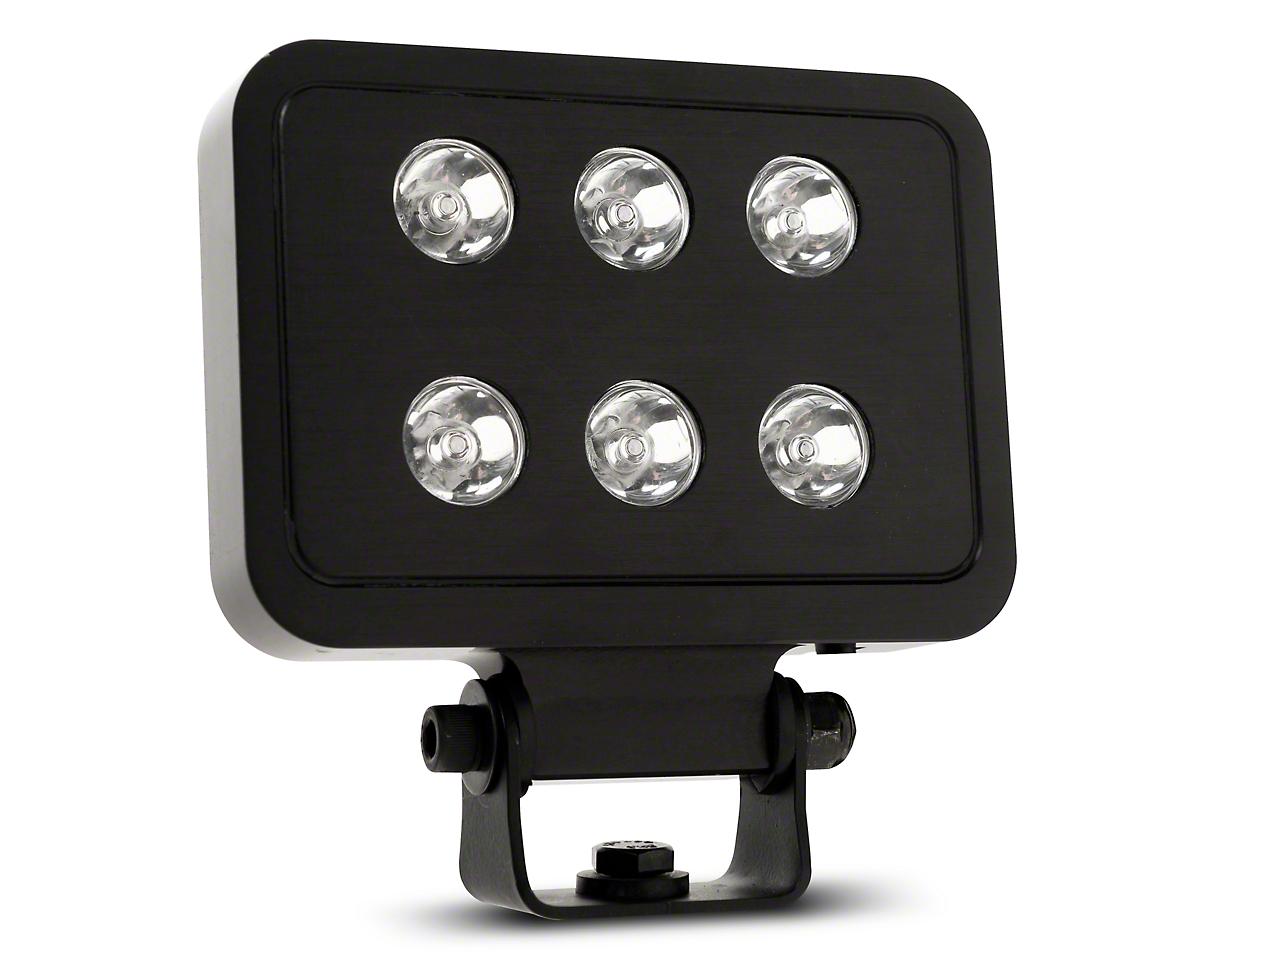 Putco 4 in. Luminix High Power Block LED Light